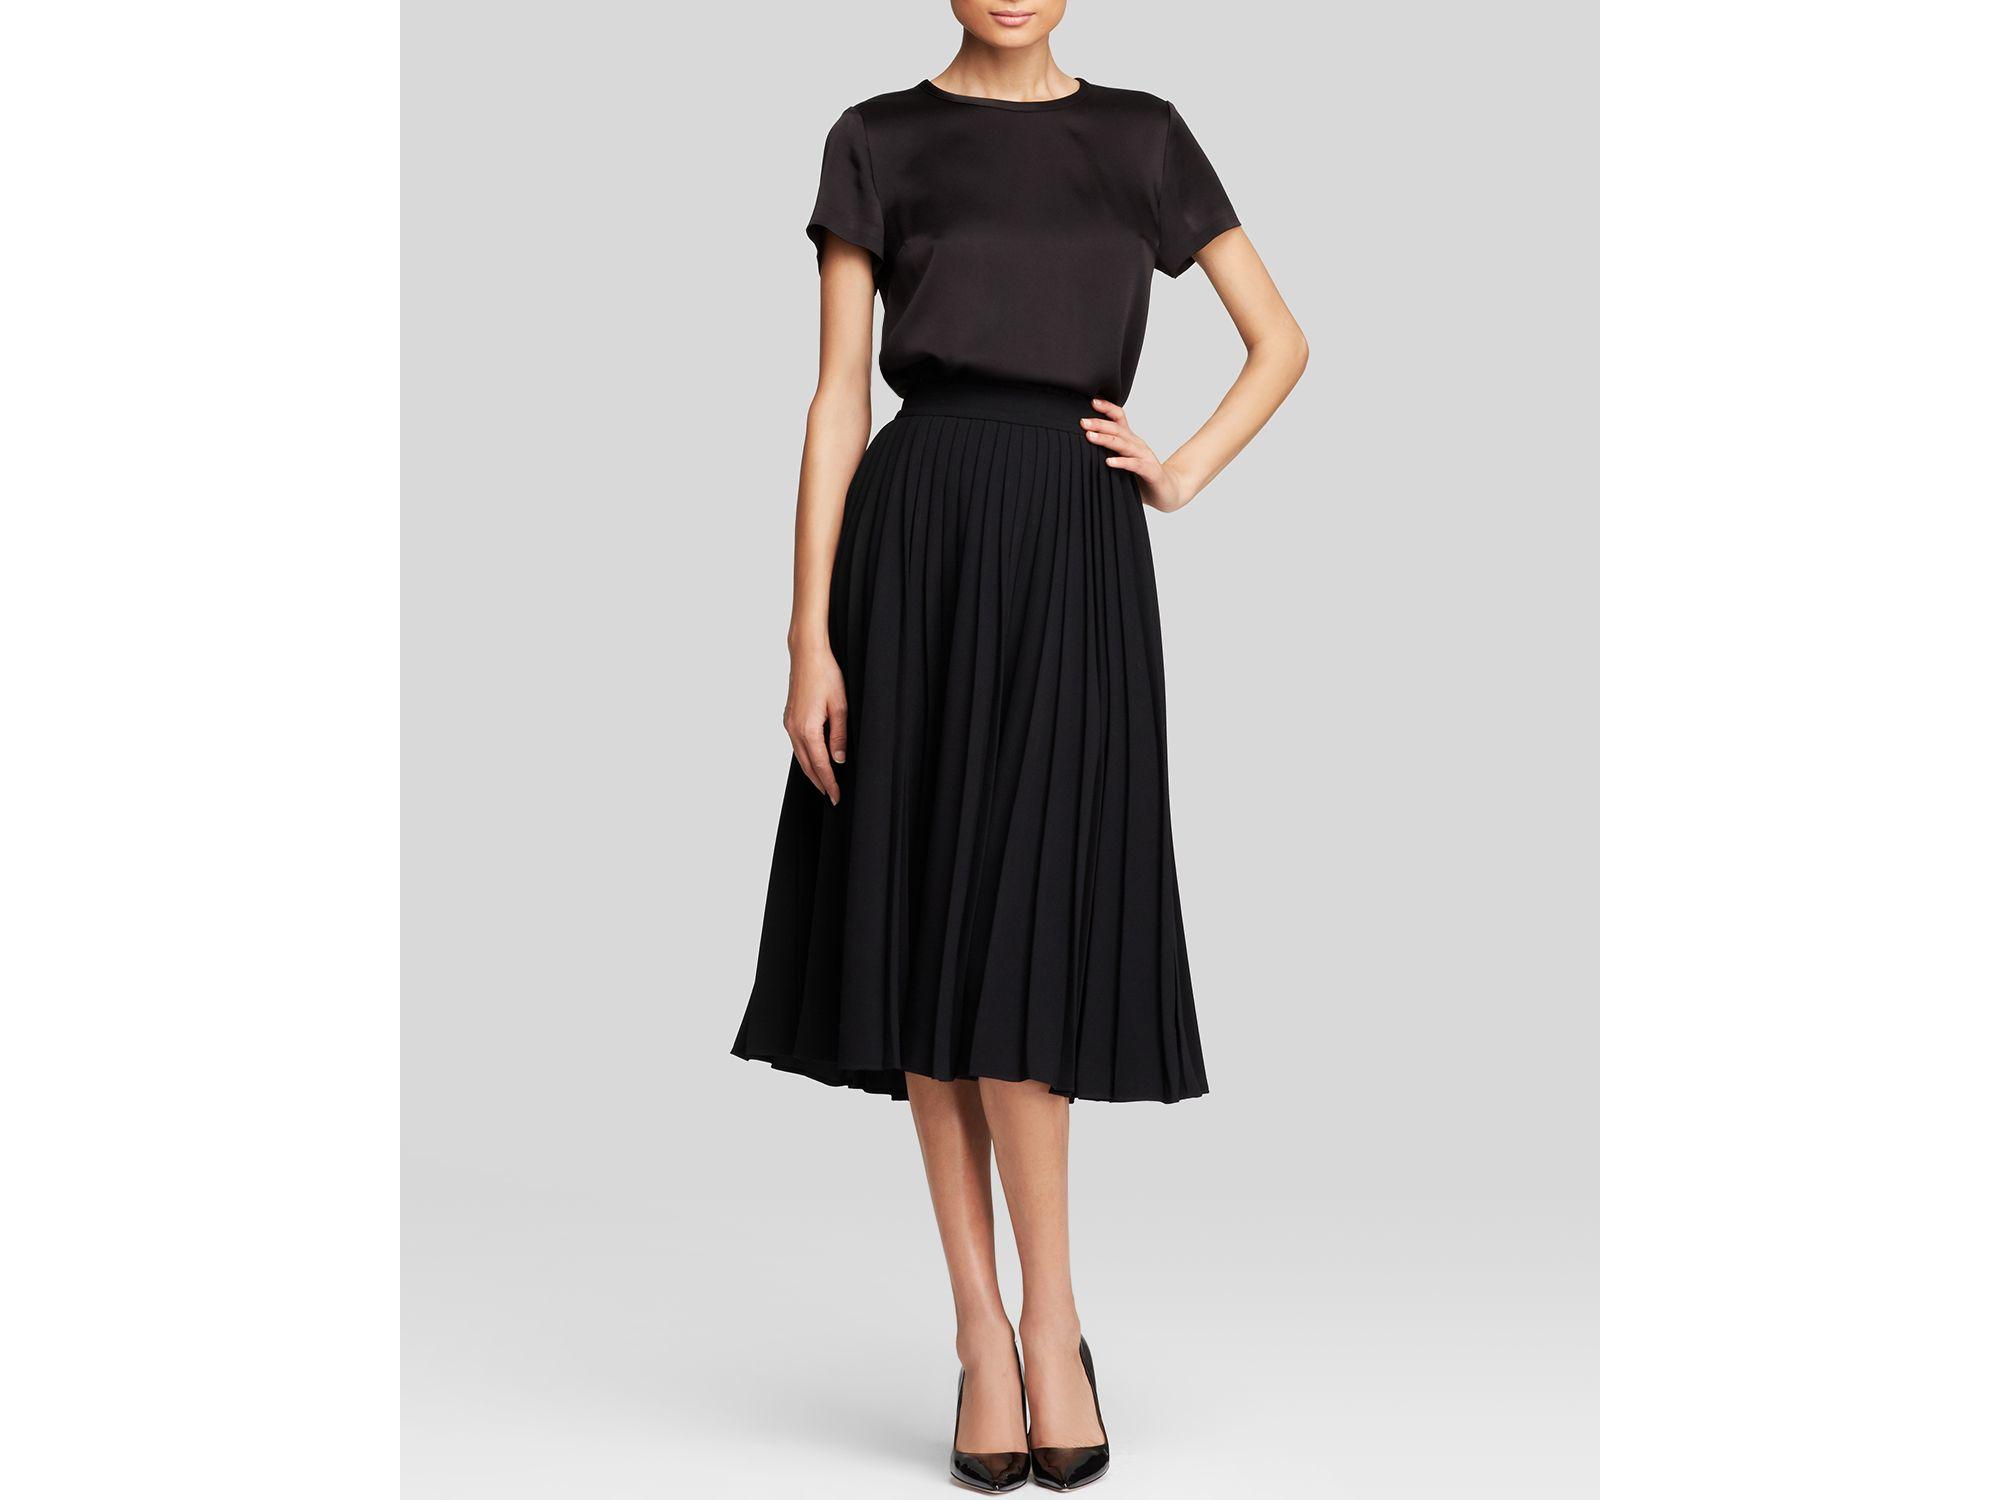 Kate spade new york Pleat Midi Skirt in Black   Lyst